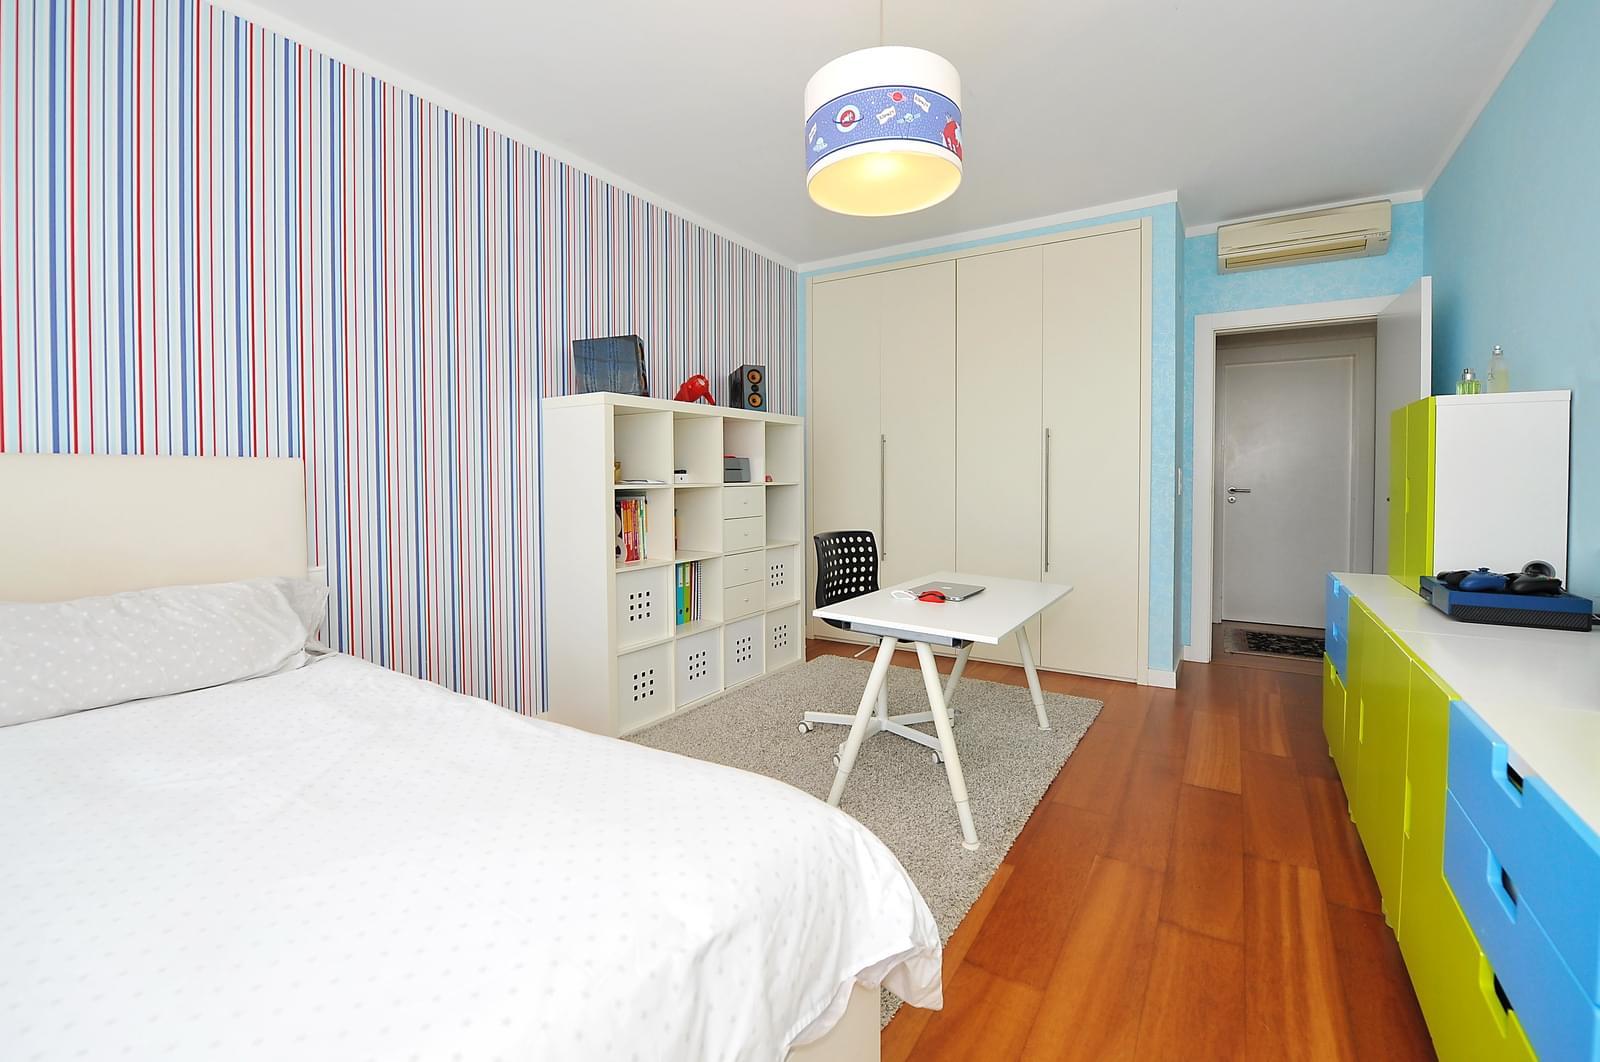 pf16896-apartamento-t4-2-oeiras-3d3fba4e-10c5-41f0-a96d-61b5f60f9c05